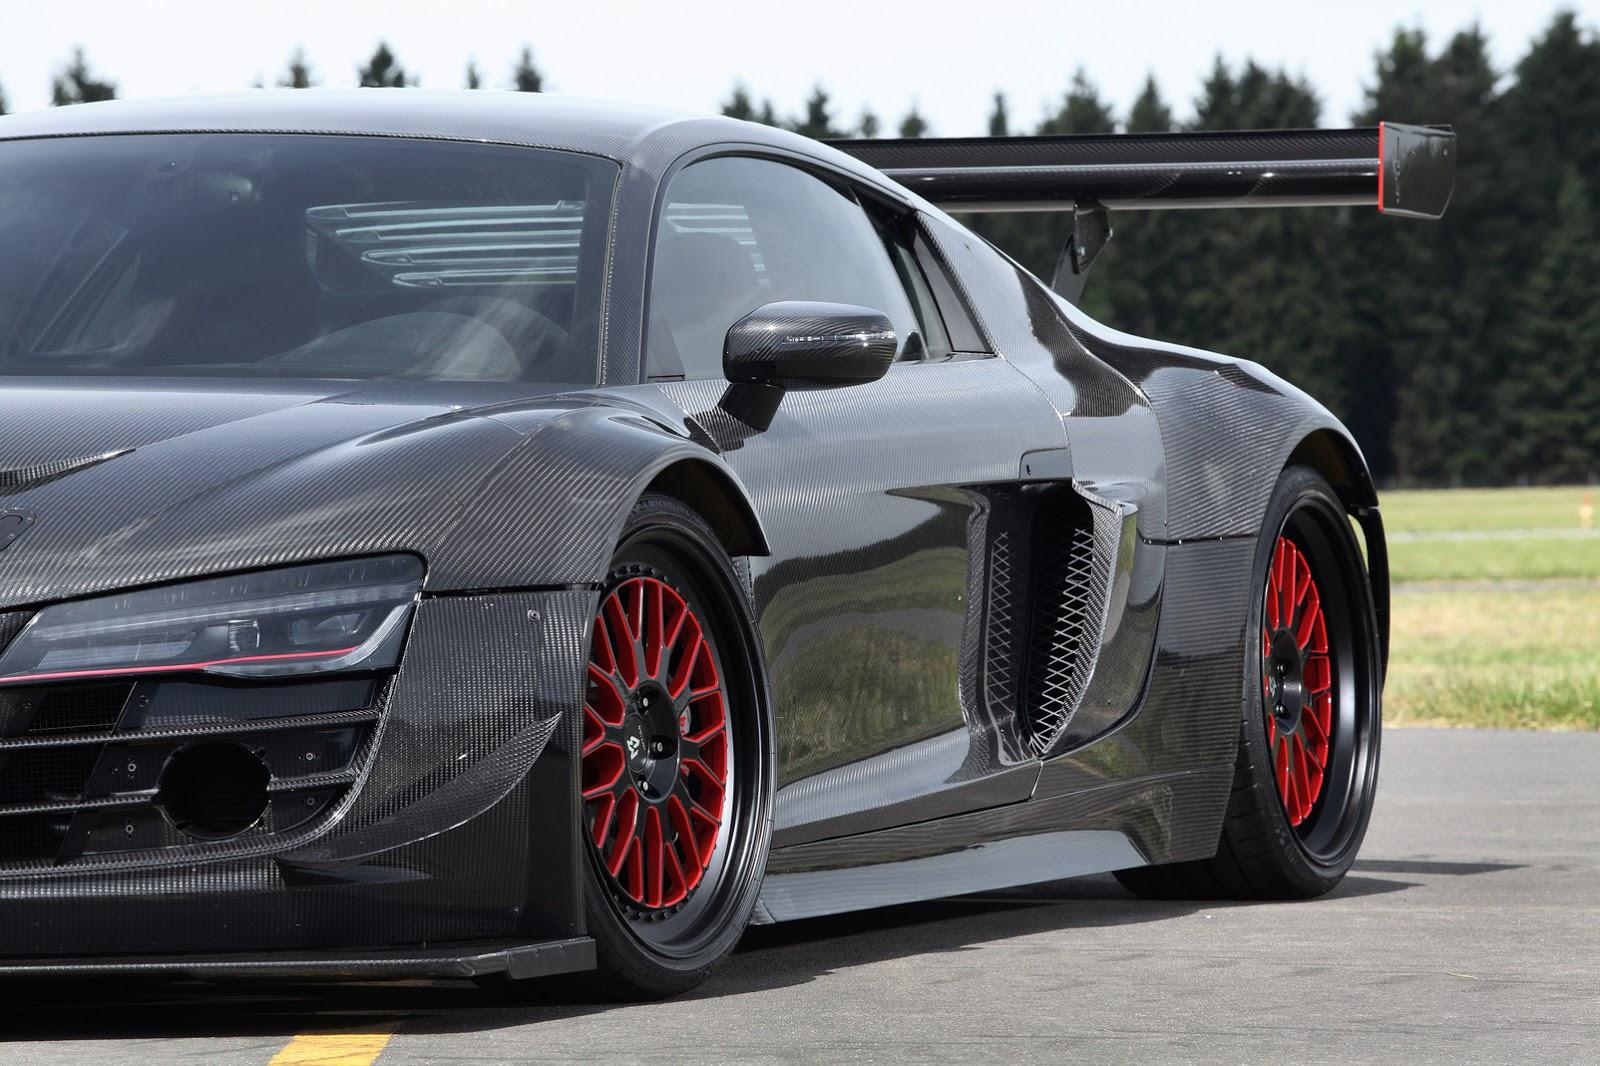 Audi-R8-Recon-MR8-1.jpg